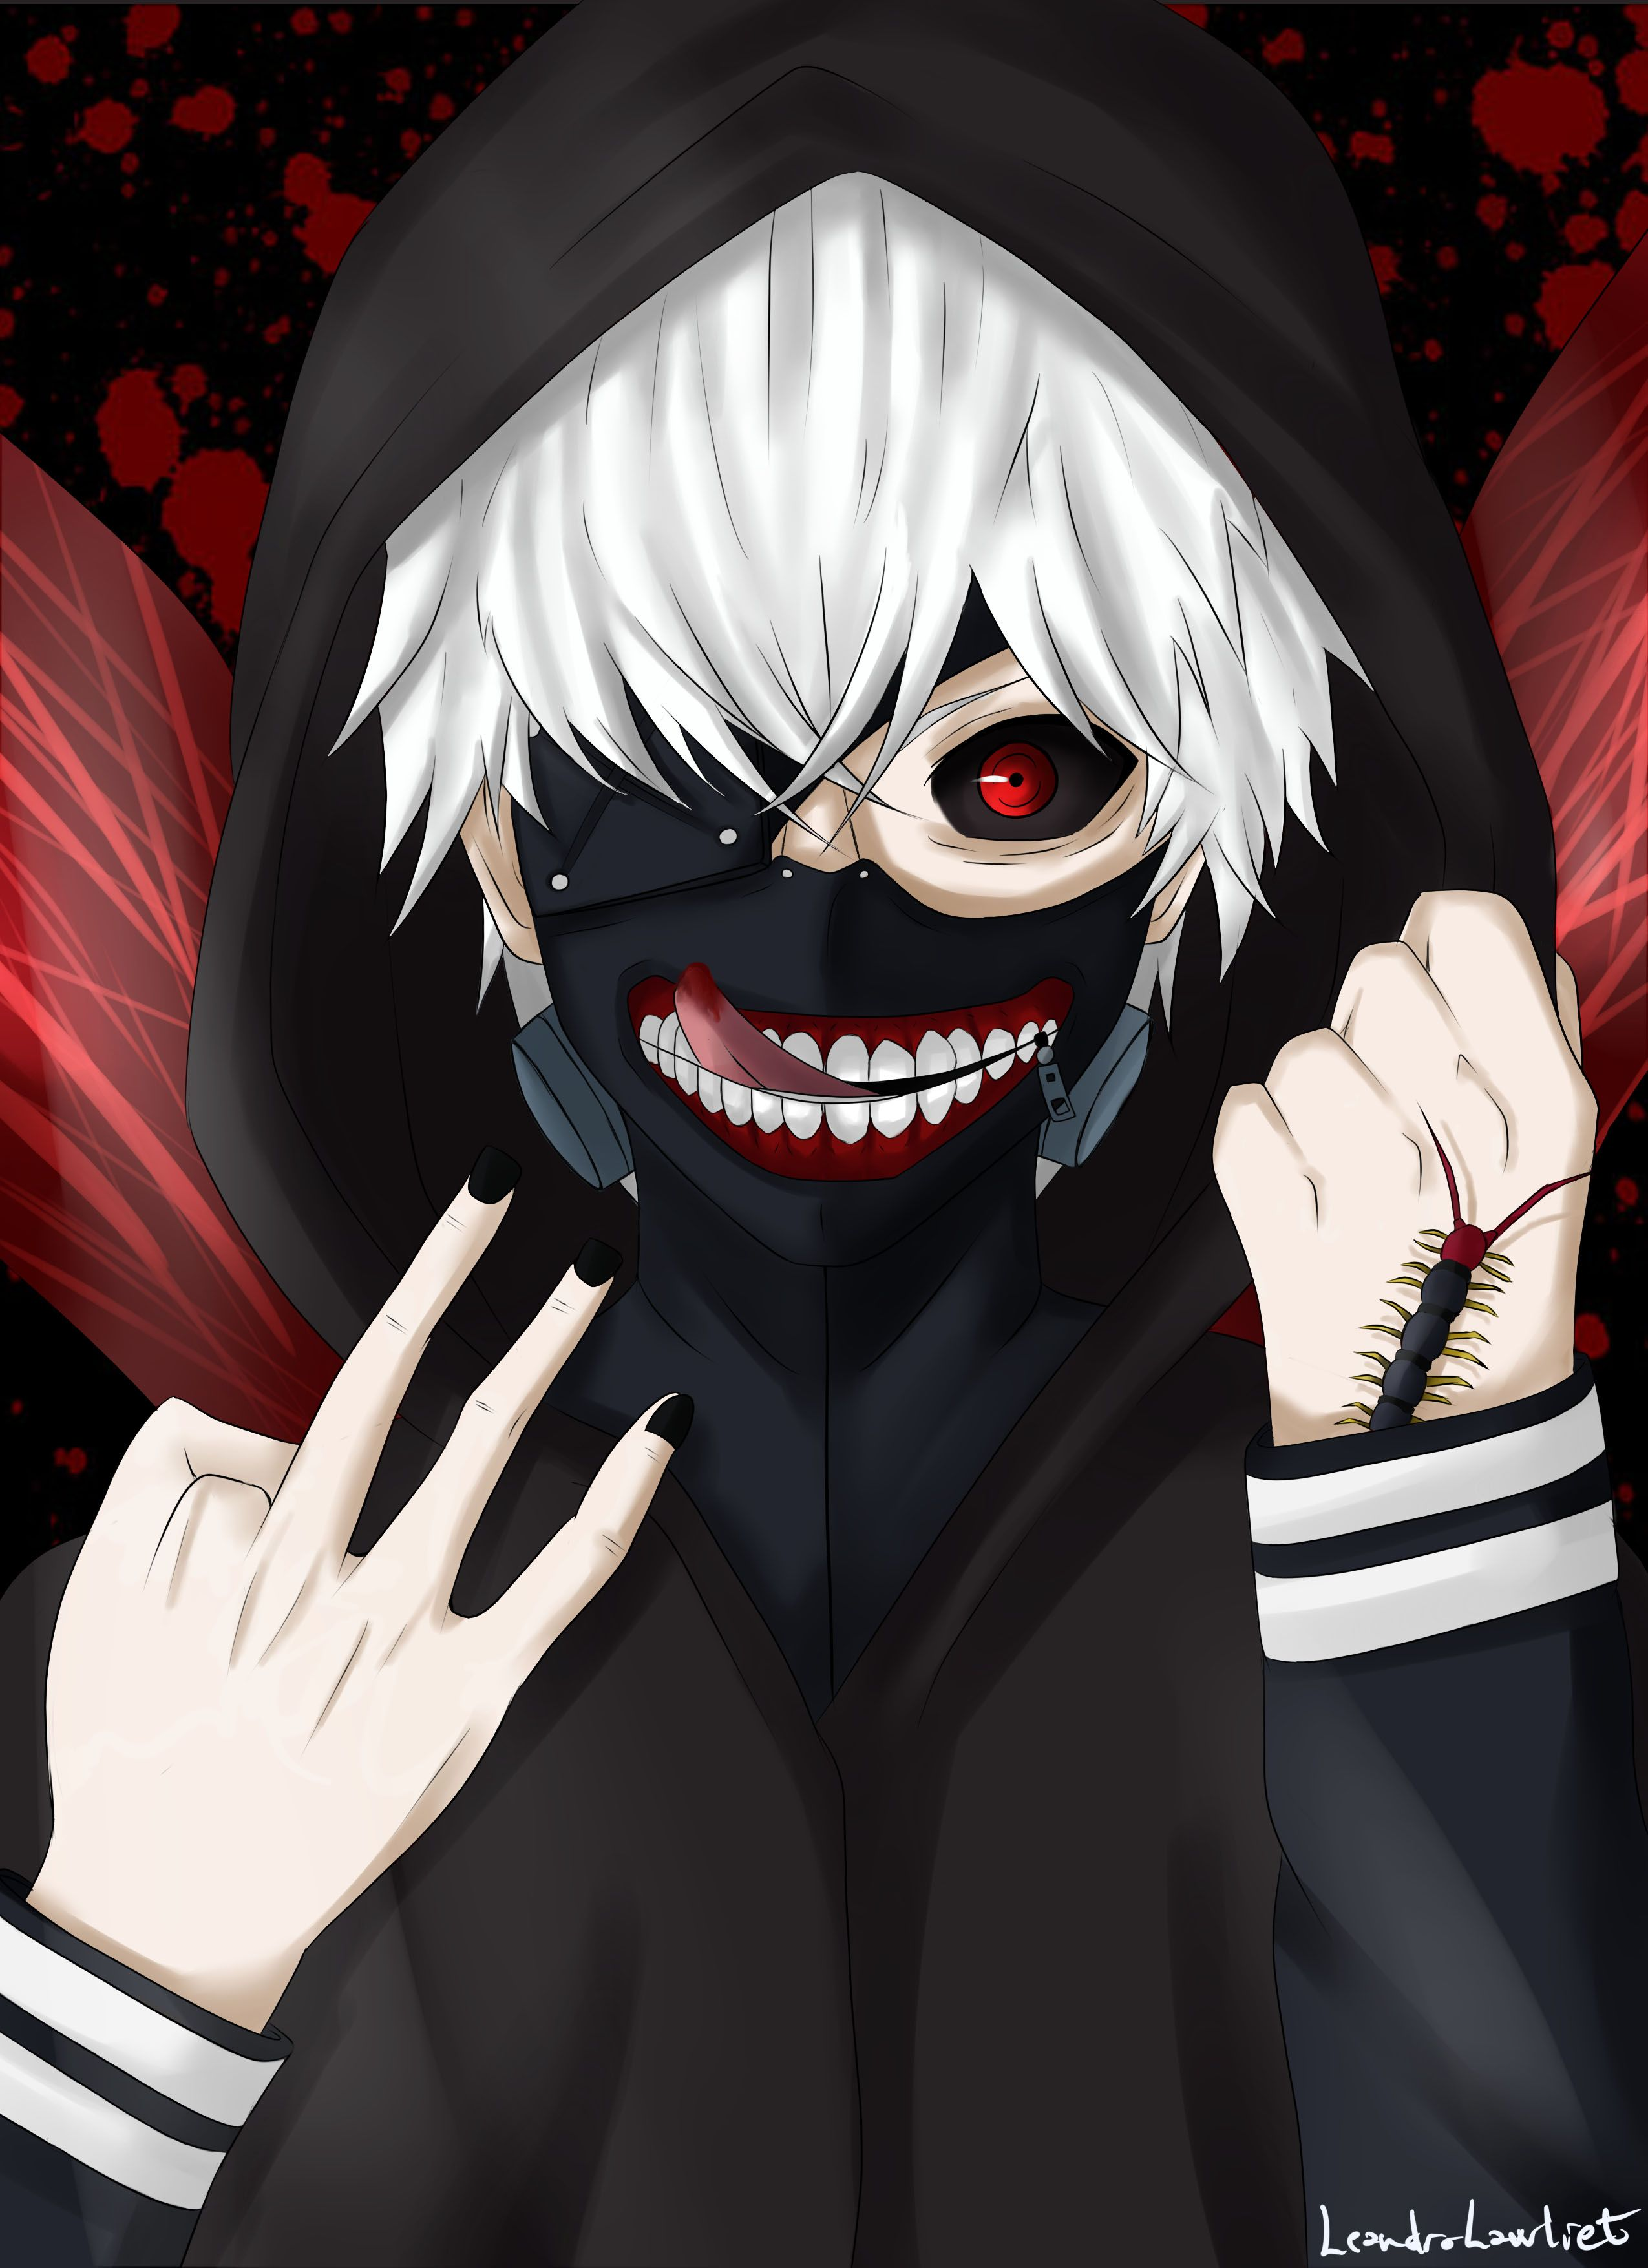 Картинка на аву аниме токийский гуль